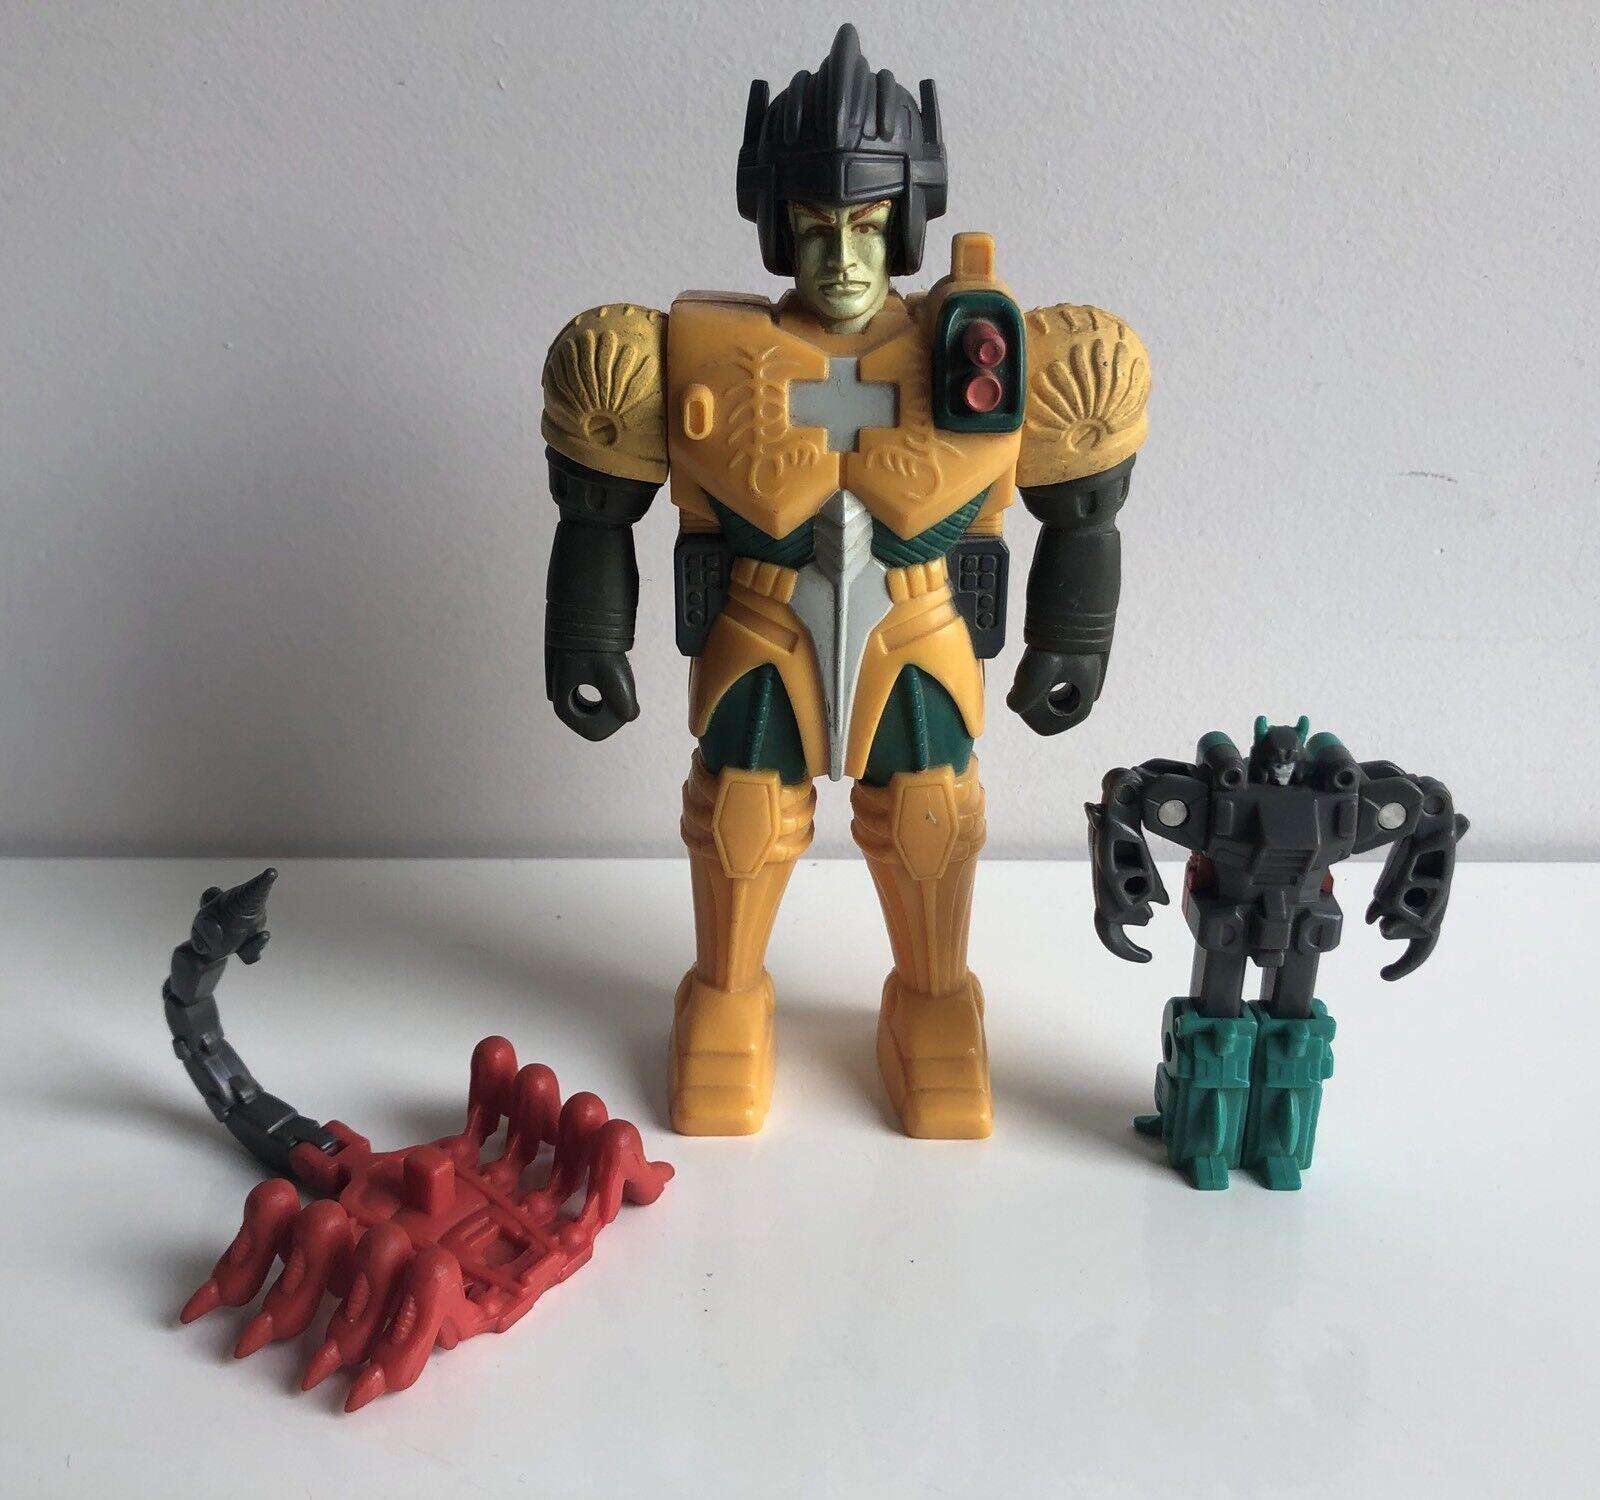 Transformers G1 Pincher Pretenders 99% Complete